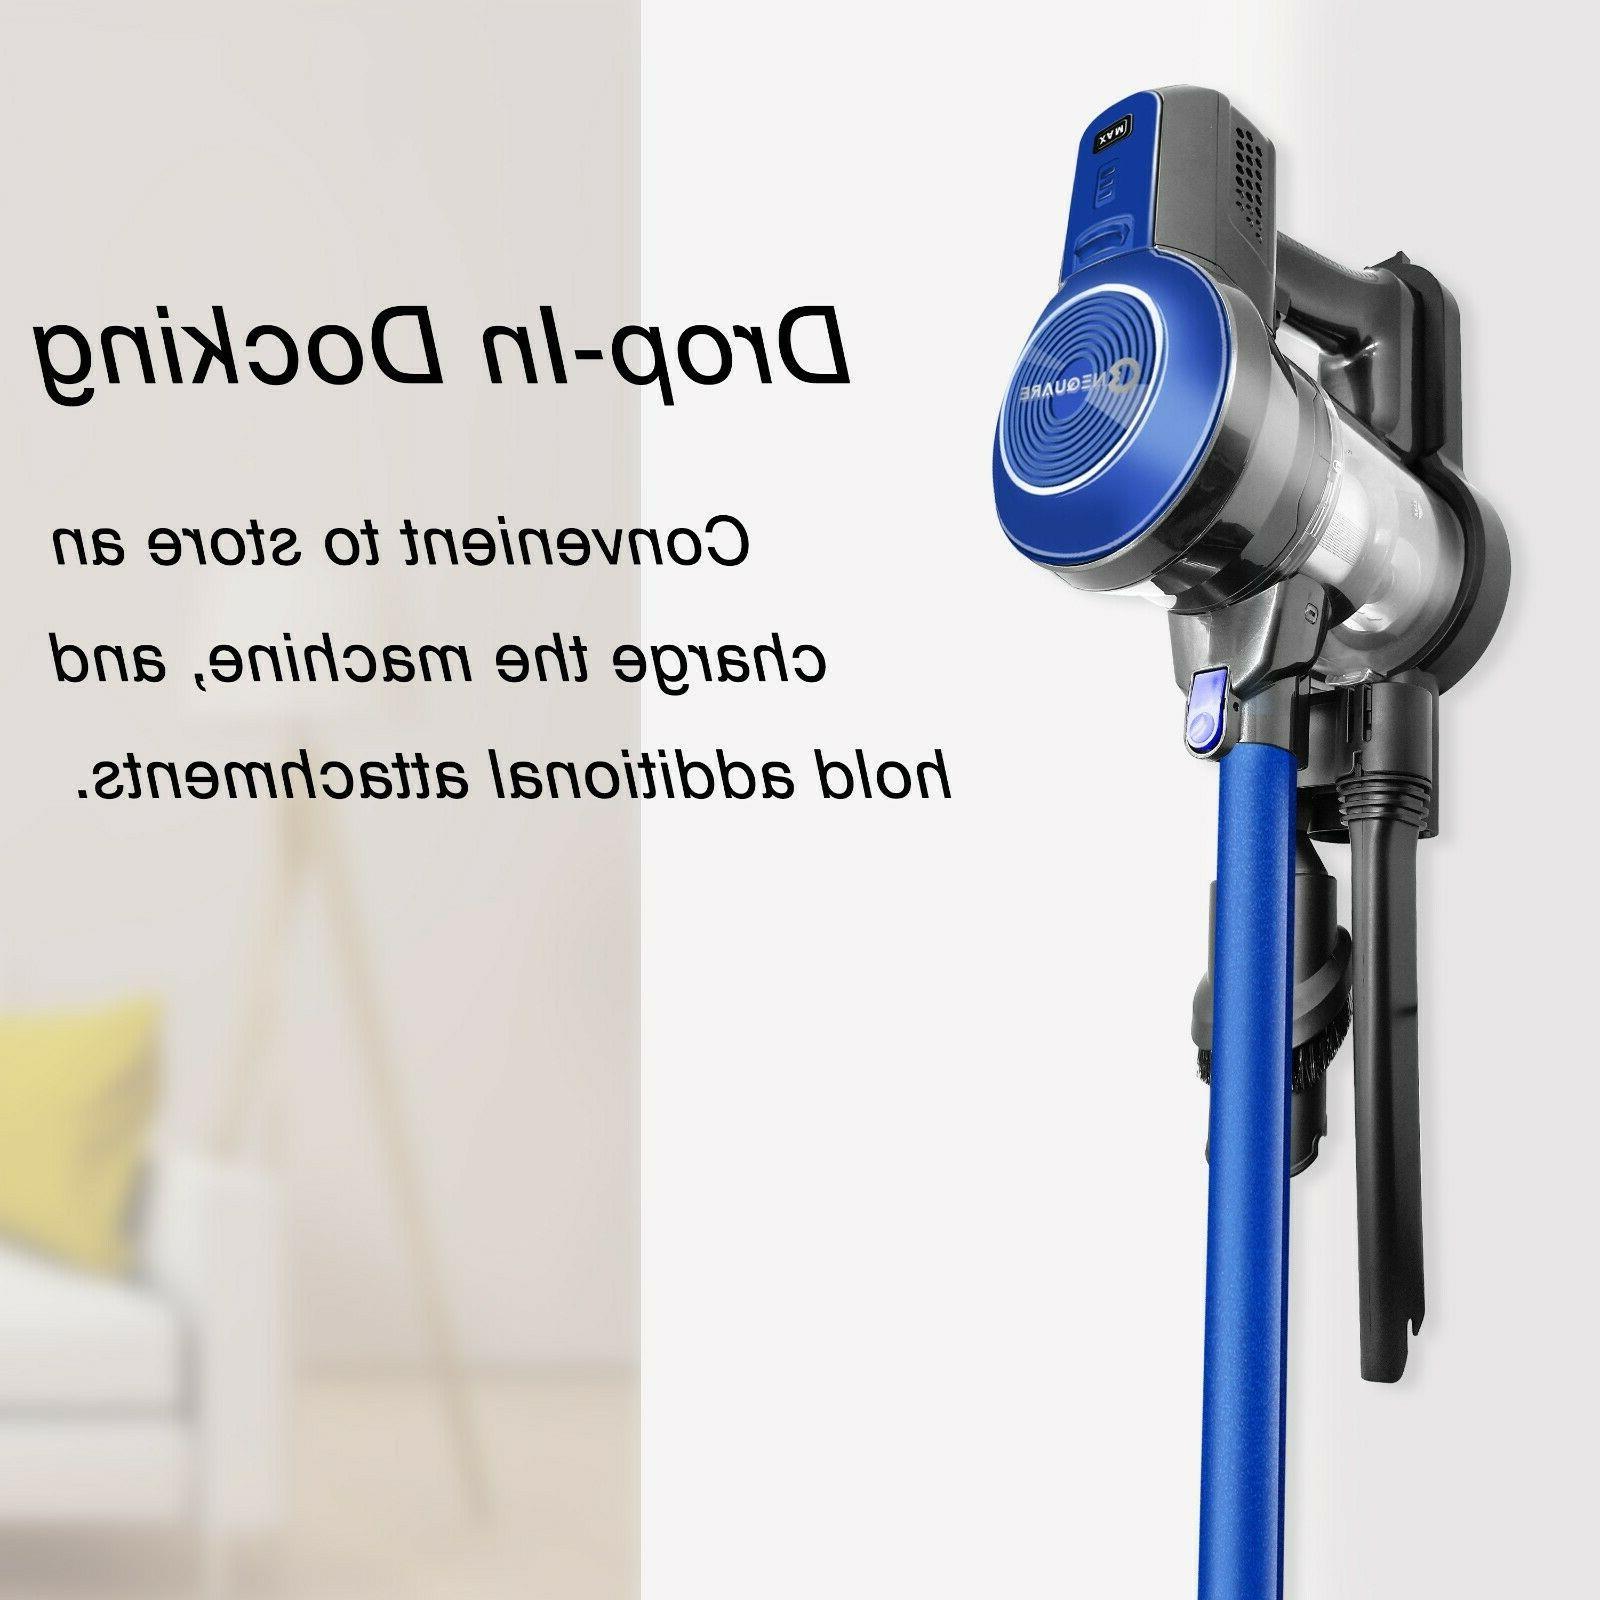 NEQUARE A18 Lightweight Home Cordless Vacuum Cleaner